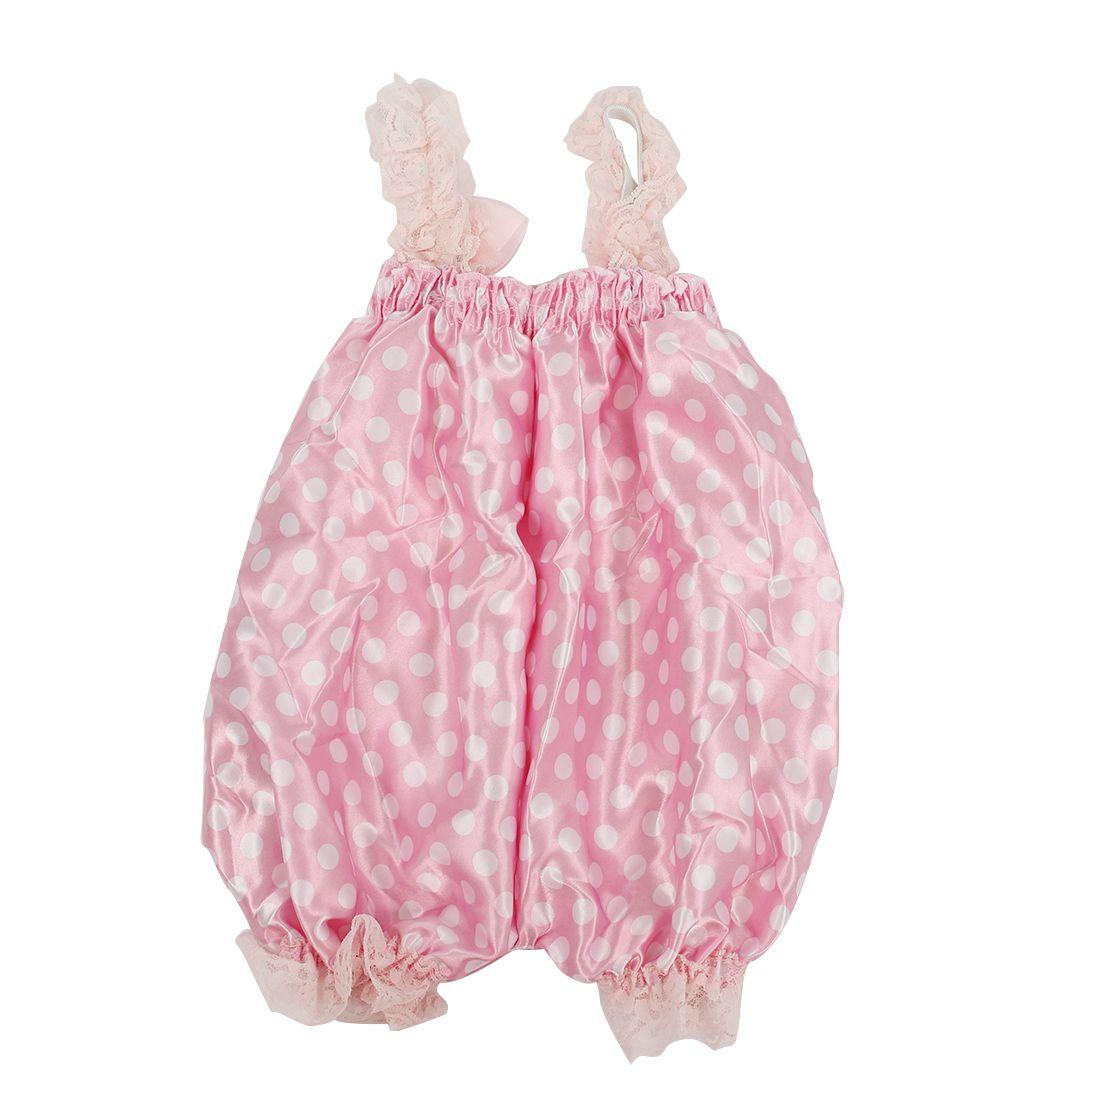 e14d85c3e93f PoshTots Newborn Infant Baby Girl Pink Dot foundation Ruffle Rompers Dress  One-Piece Tutu Lace Clothes (1-2 yrs) - Buy PoshTots Newborn Infant Baby  Girl ...